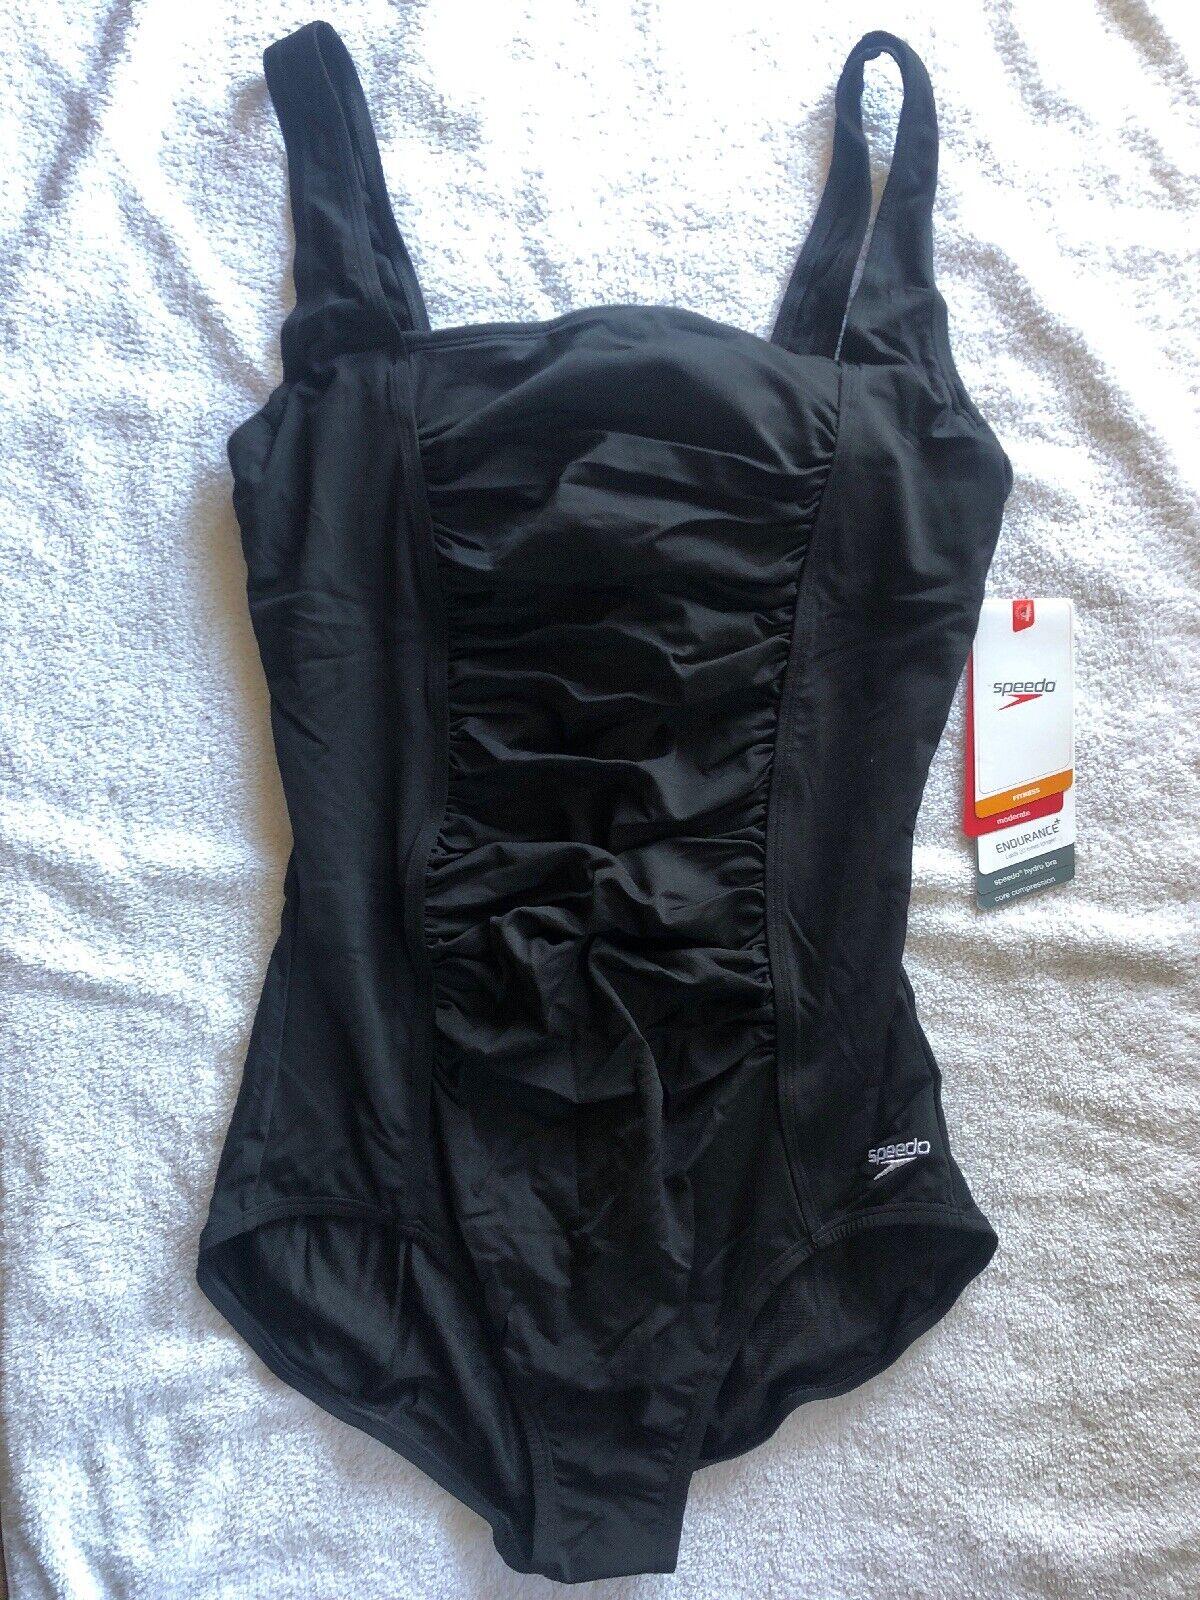 PDSF  82 Speedo One Piece Fitness Maillot De Bain Taille 16 Noir Neuf Avec étiquettes maillot de bain Sport